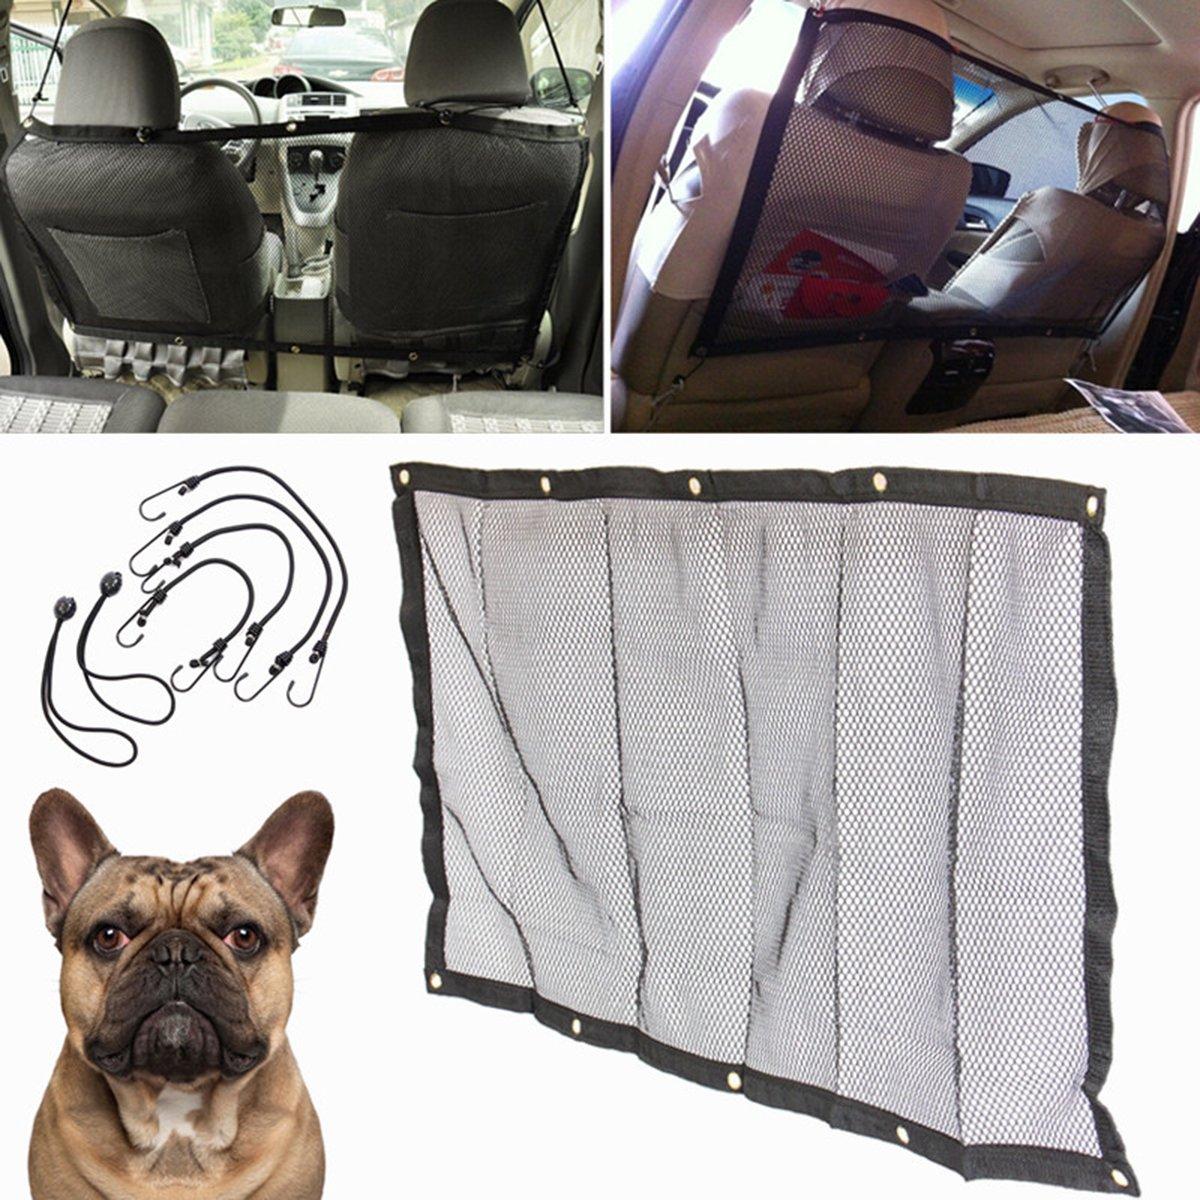 Pet Car Net Focuspet Car Safety Net Car Travel Pet Net barrier Dog Net Vehicle Dog Cat Car Barrier Safety Net with Hooks and Cords Black 45x24.5